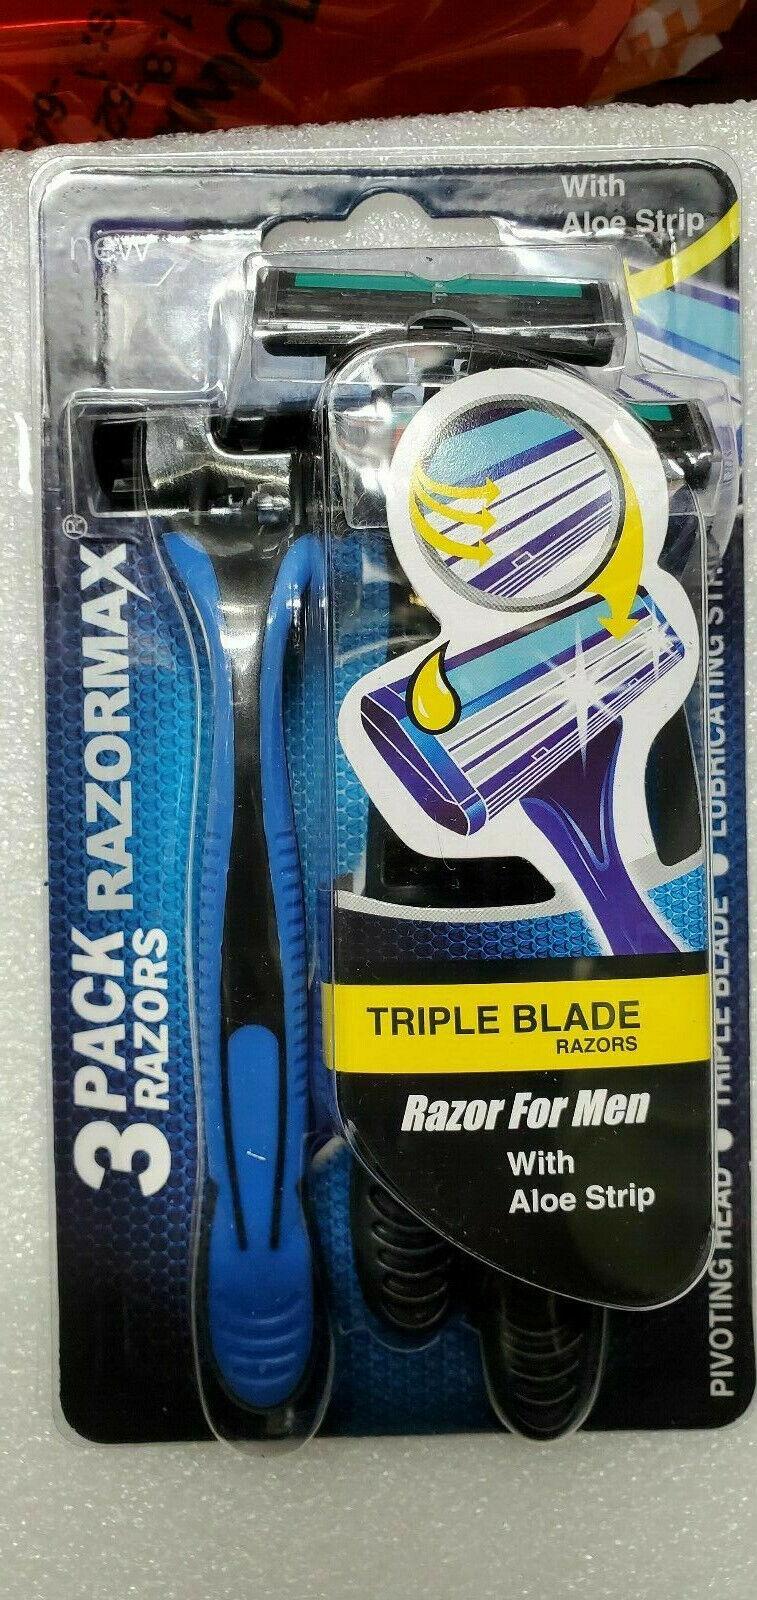 triple blade disposable razors with aloe strip